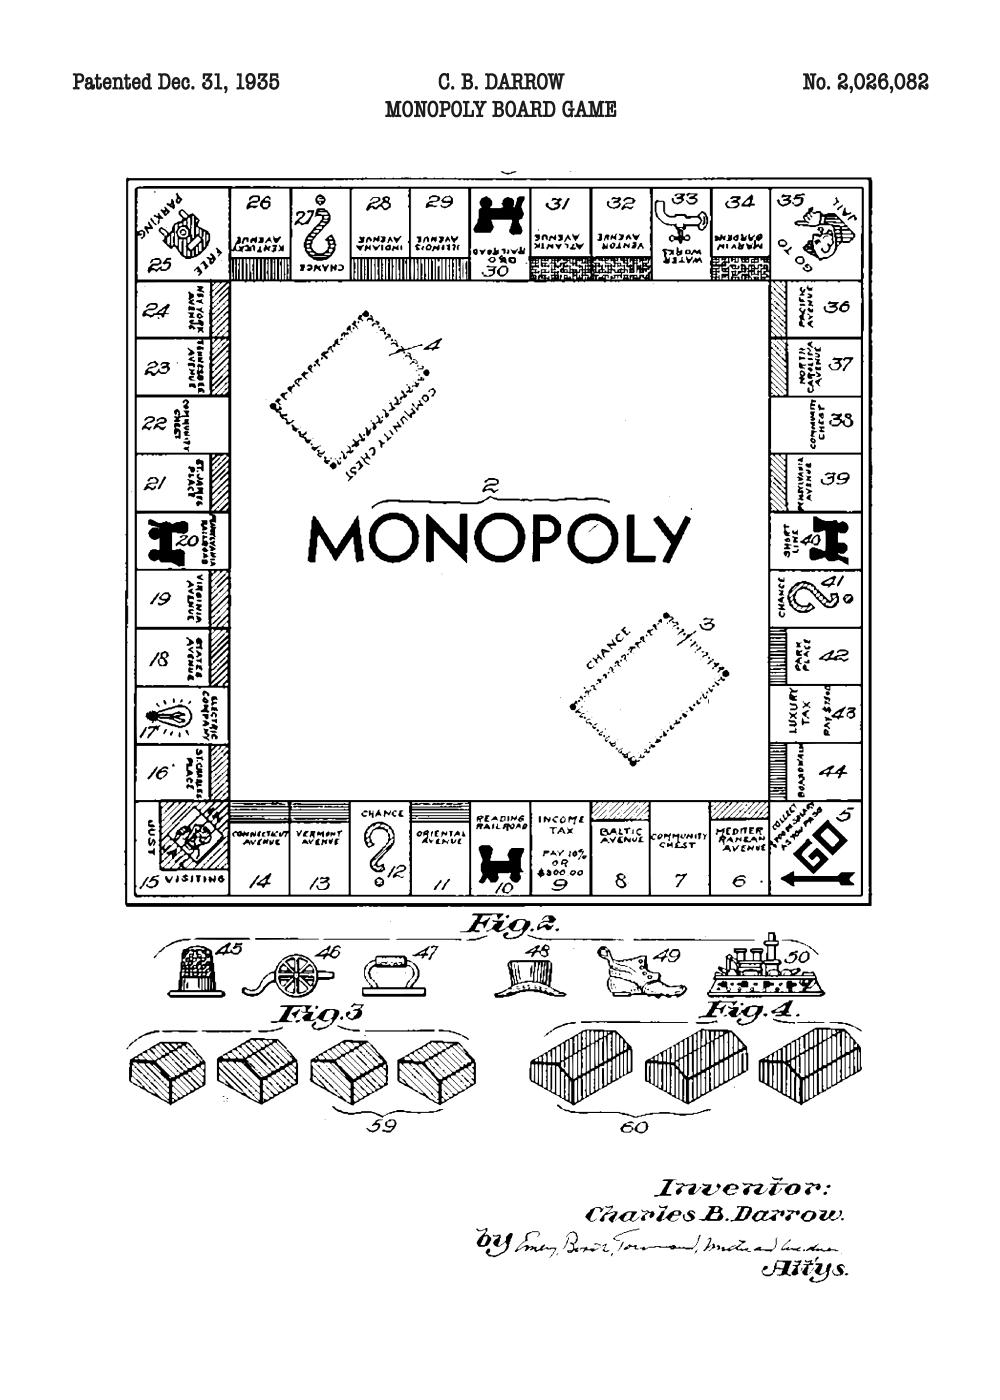 Monopoly plakat - Original patent tegning